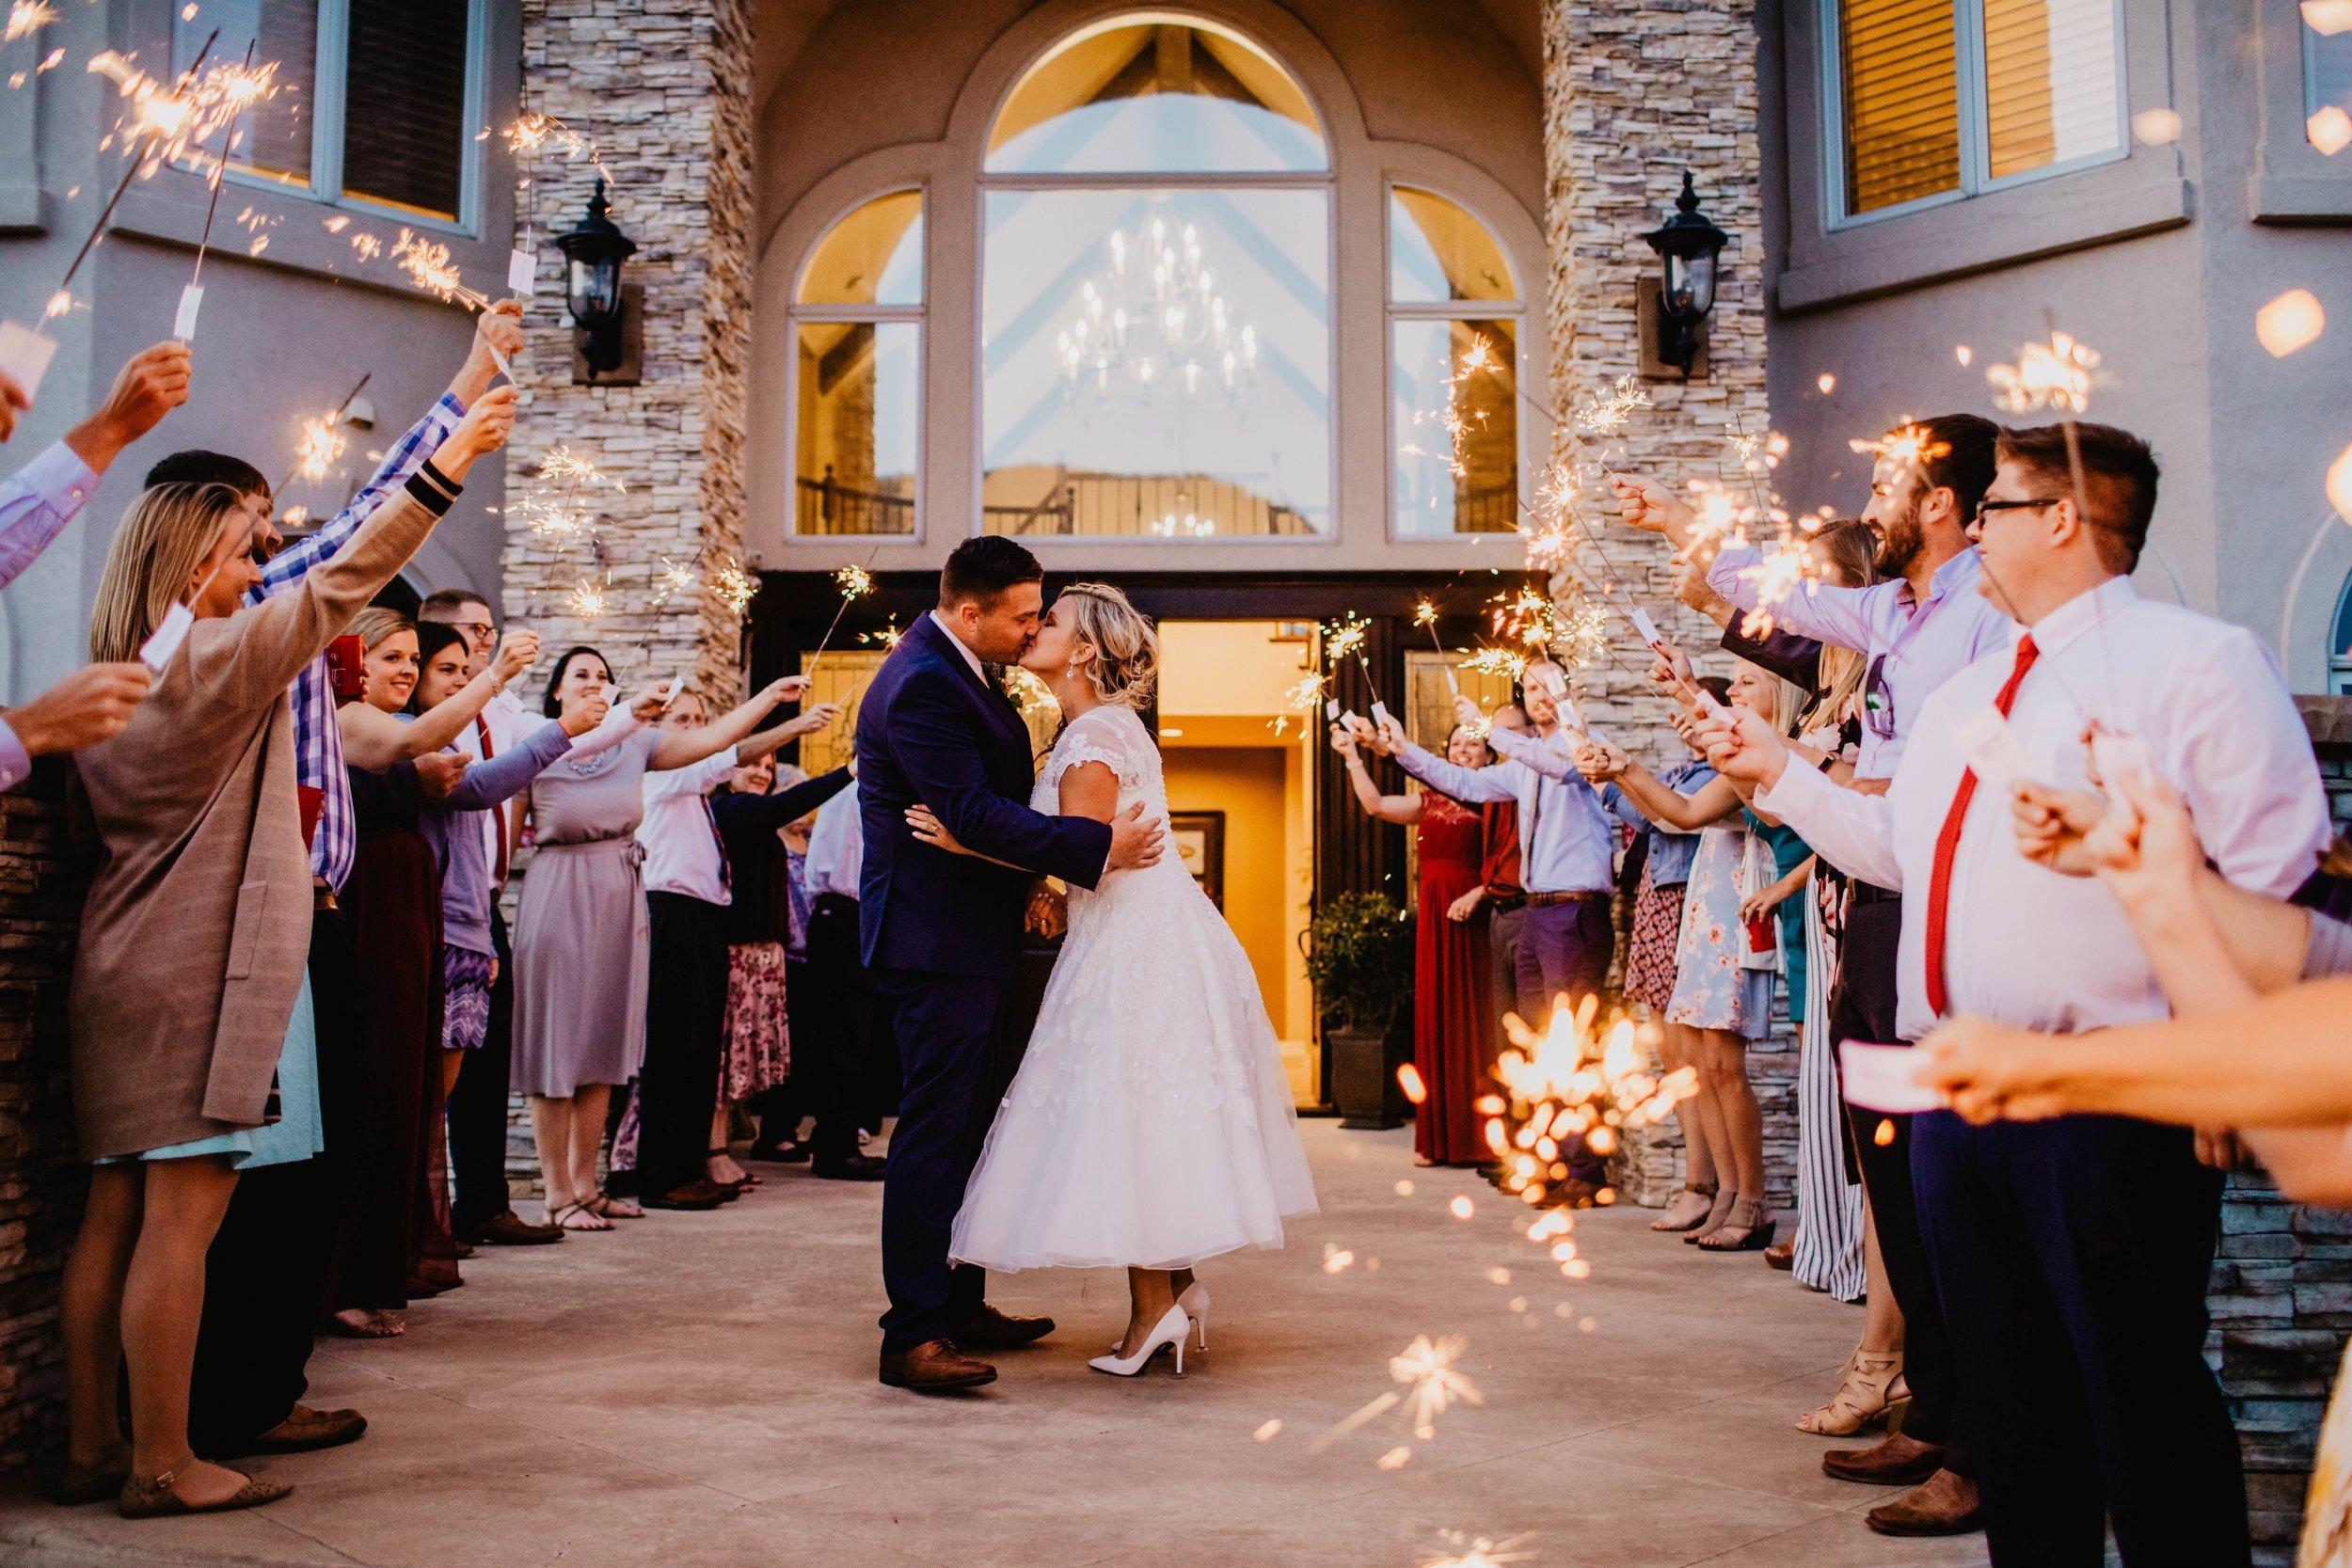 Kisa Conrad Favorites-0066-colorado-wedding-photographer-denver-springs-vail.jpeg